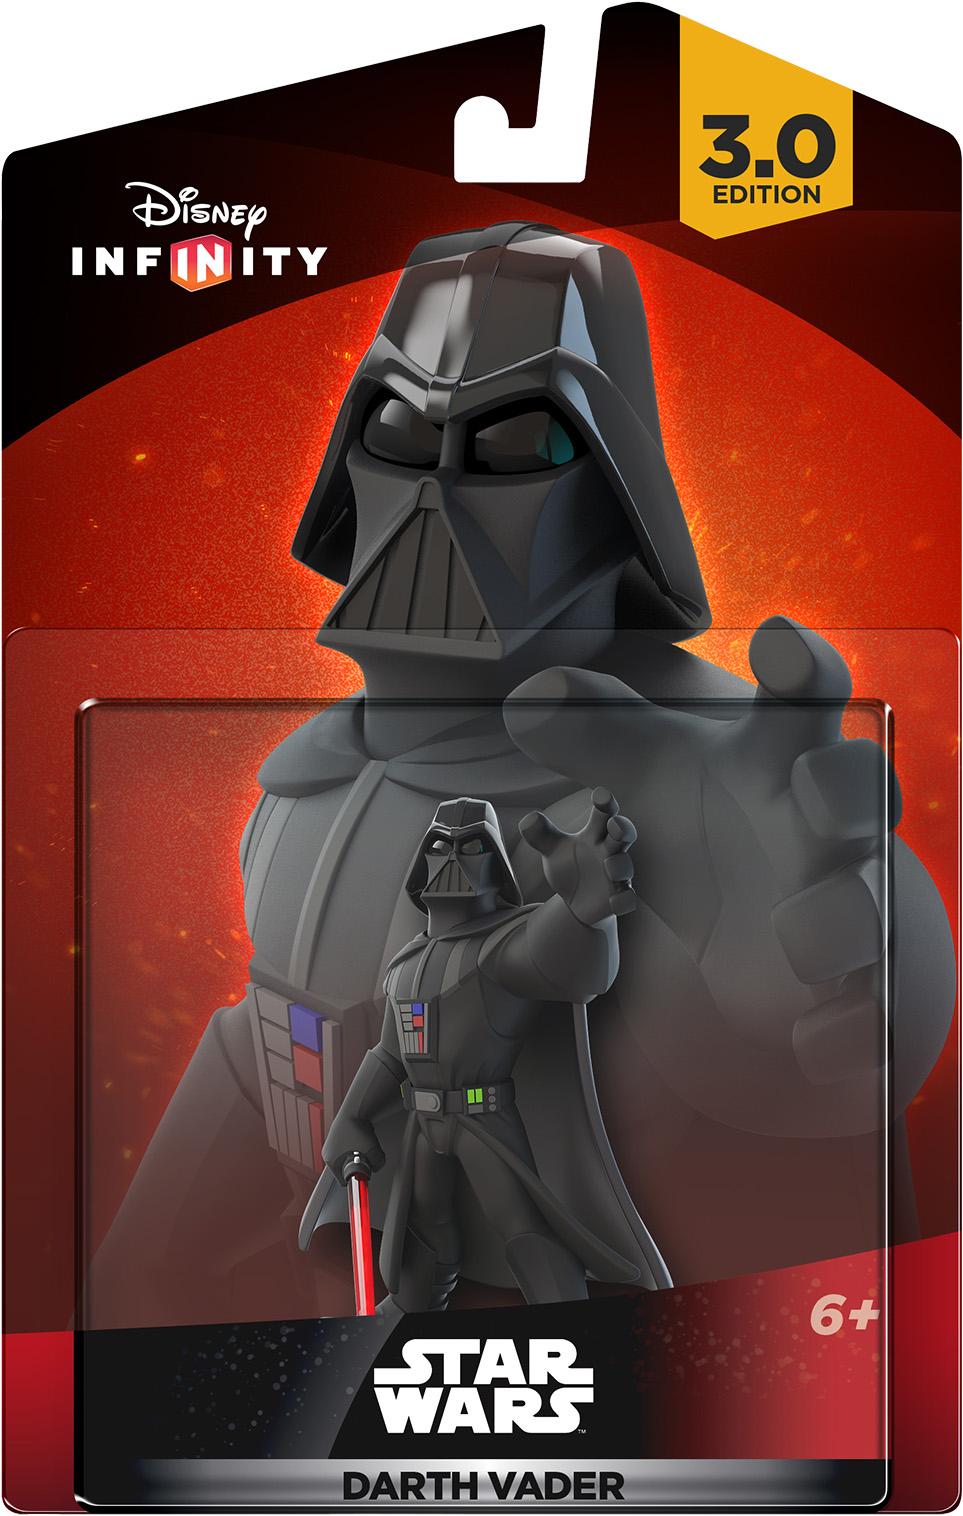 Disney Infinity 3.0 Figure: Darth Vader